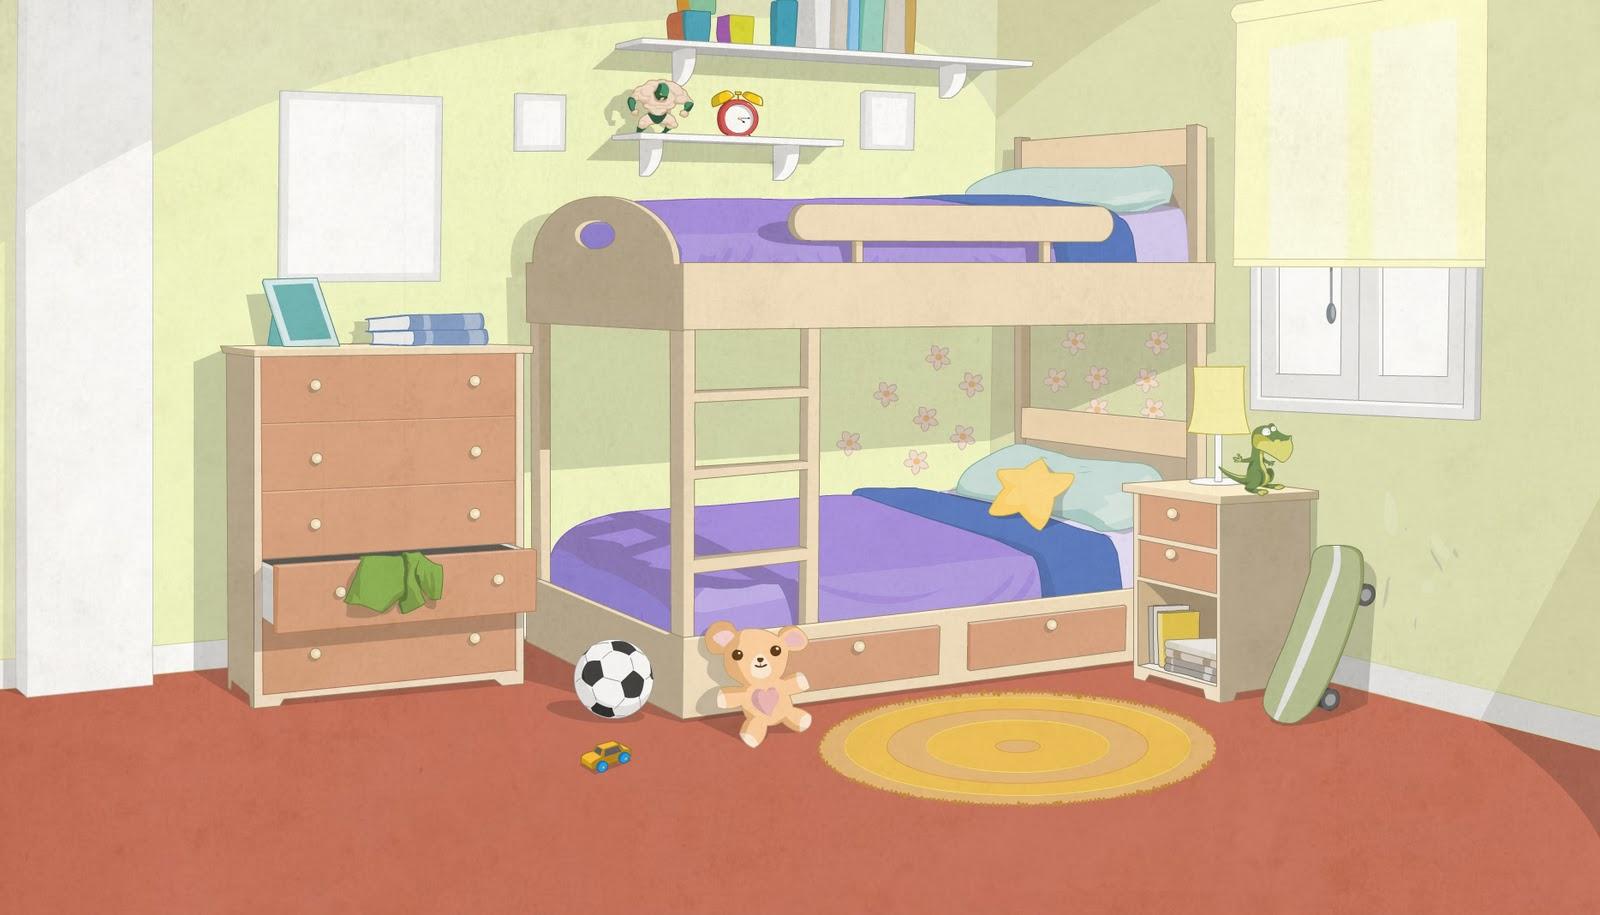 Mansilla ilustraciones for Dormitorio animado